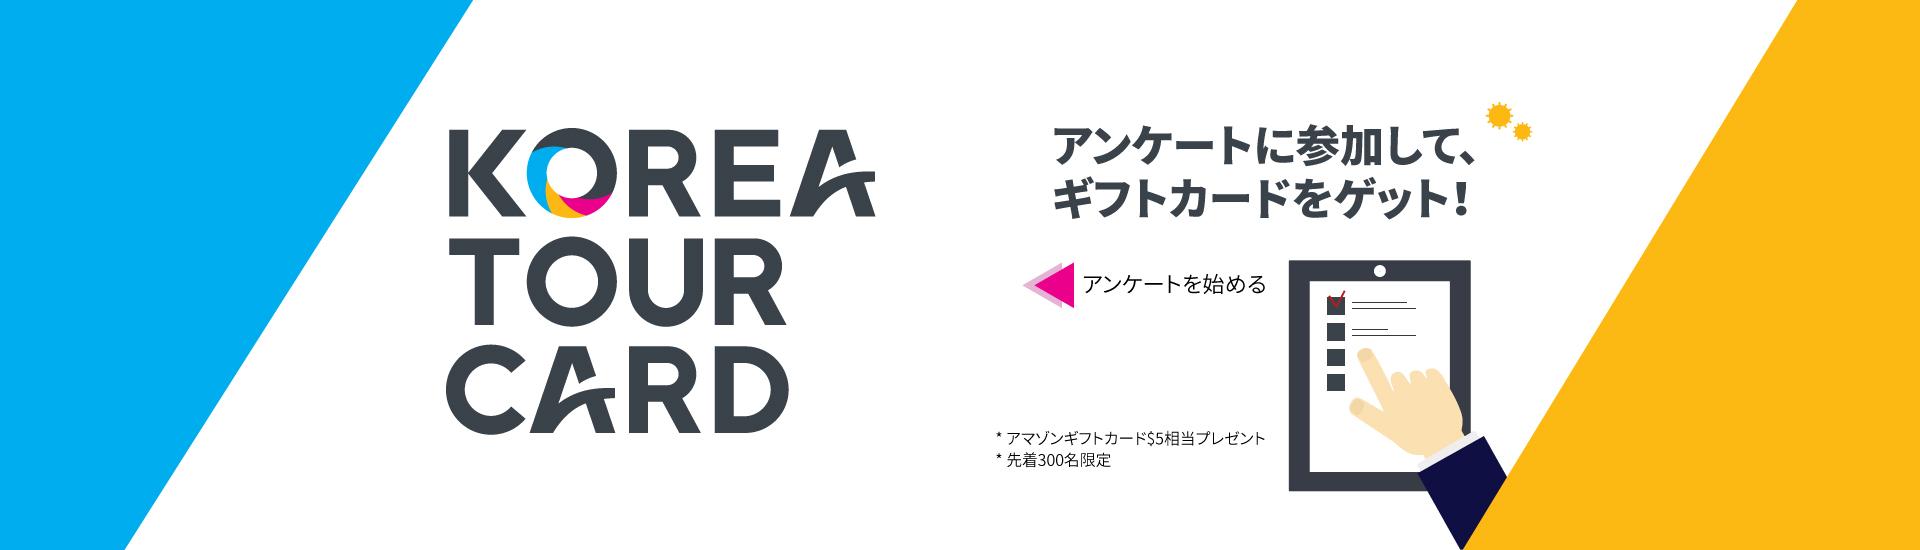 KOREA TOUR CARD Survey